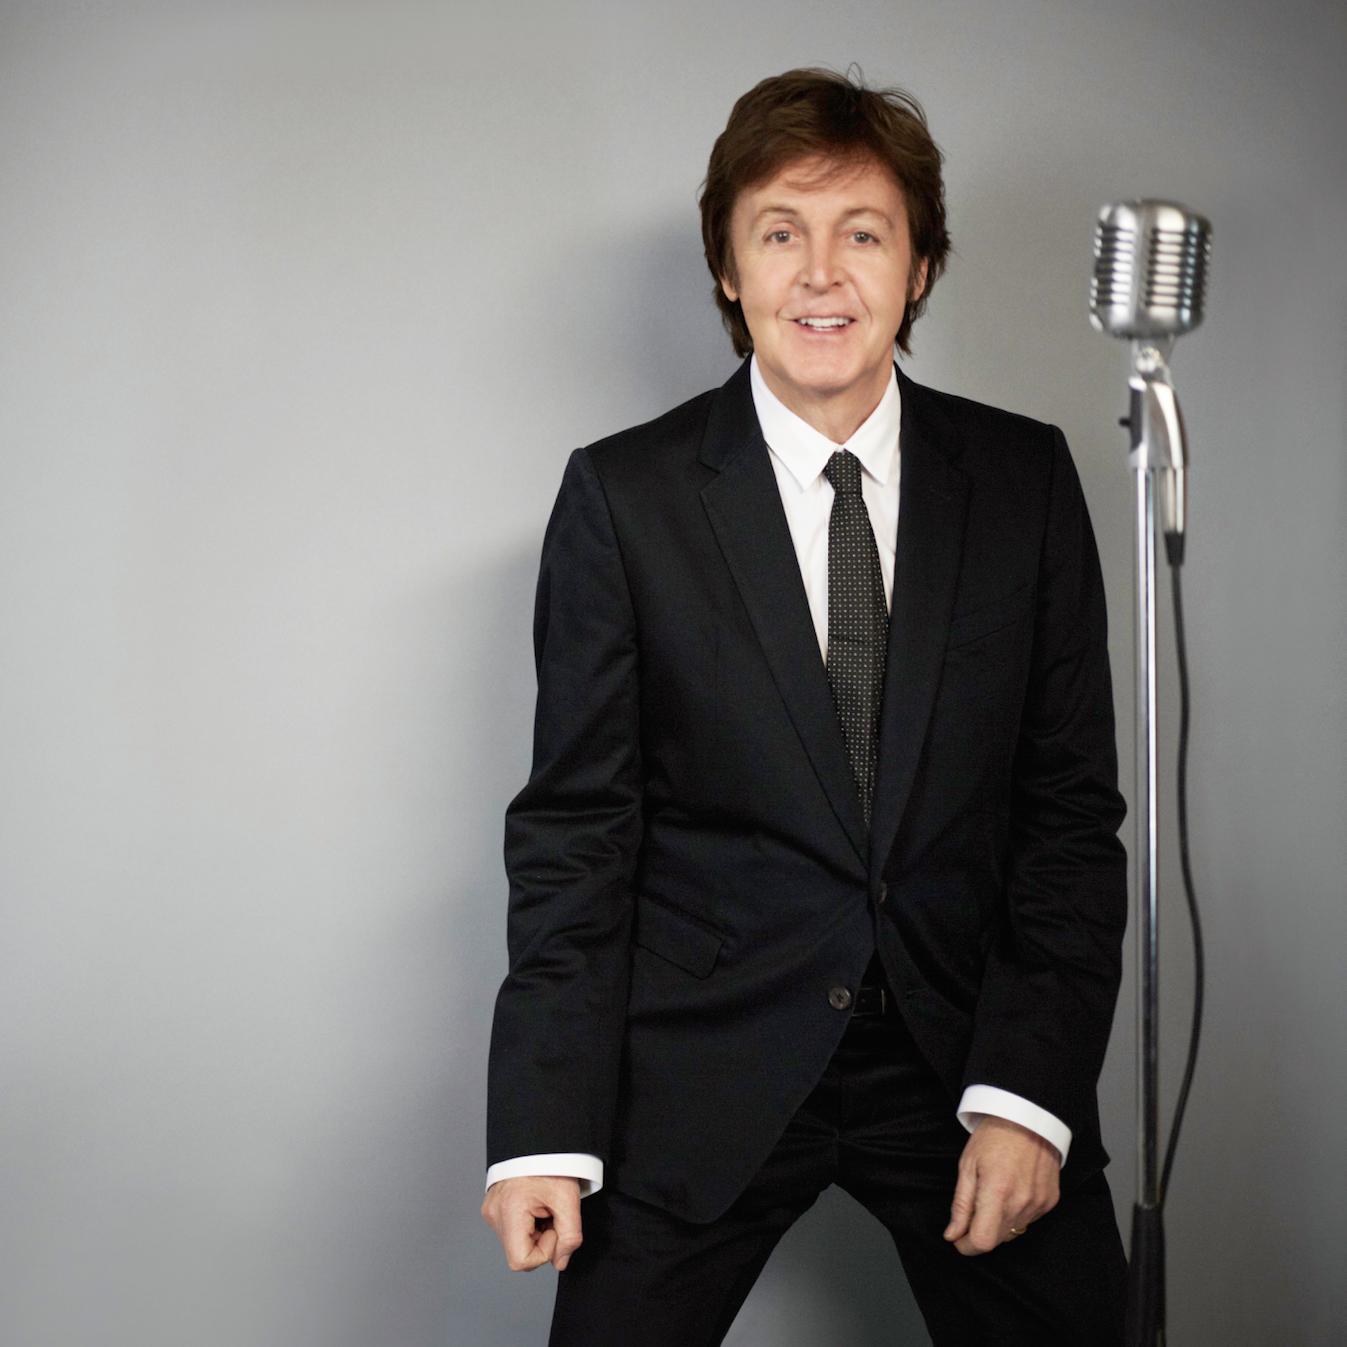 Paul McCartney's 10 Best Bass Lines | List 'Em Carefully